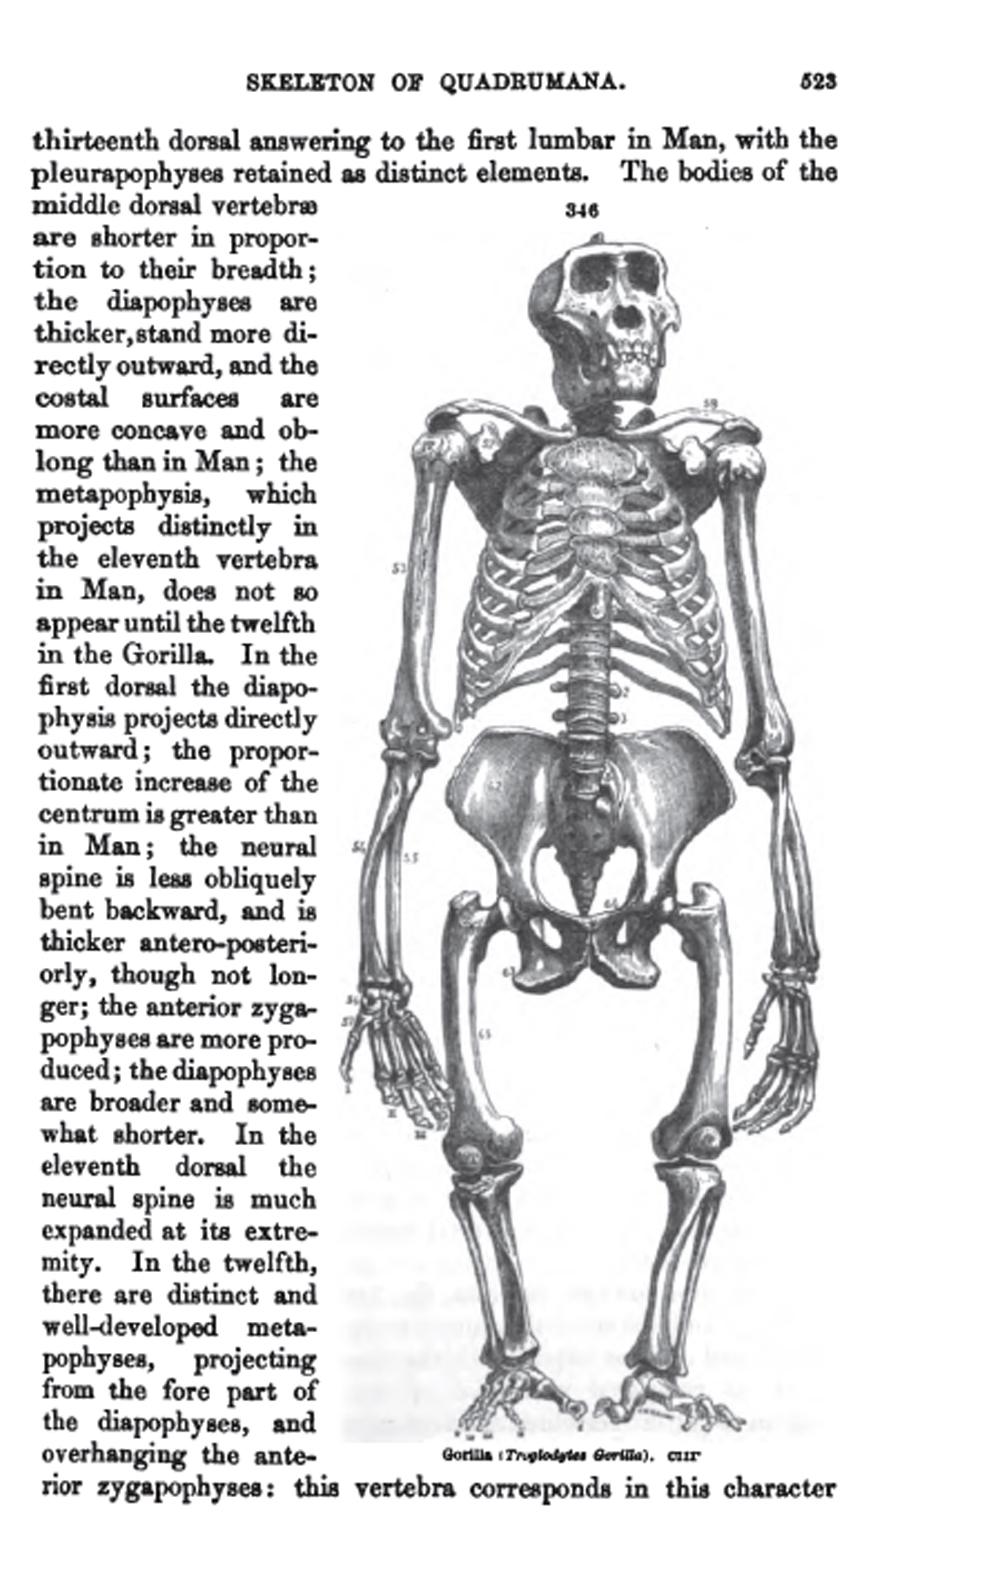 Richard Owen (biografía - cronología - obra) ~ Exóticas Lecturas ...